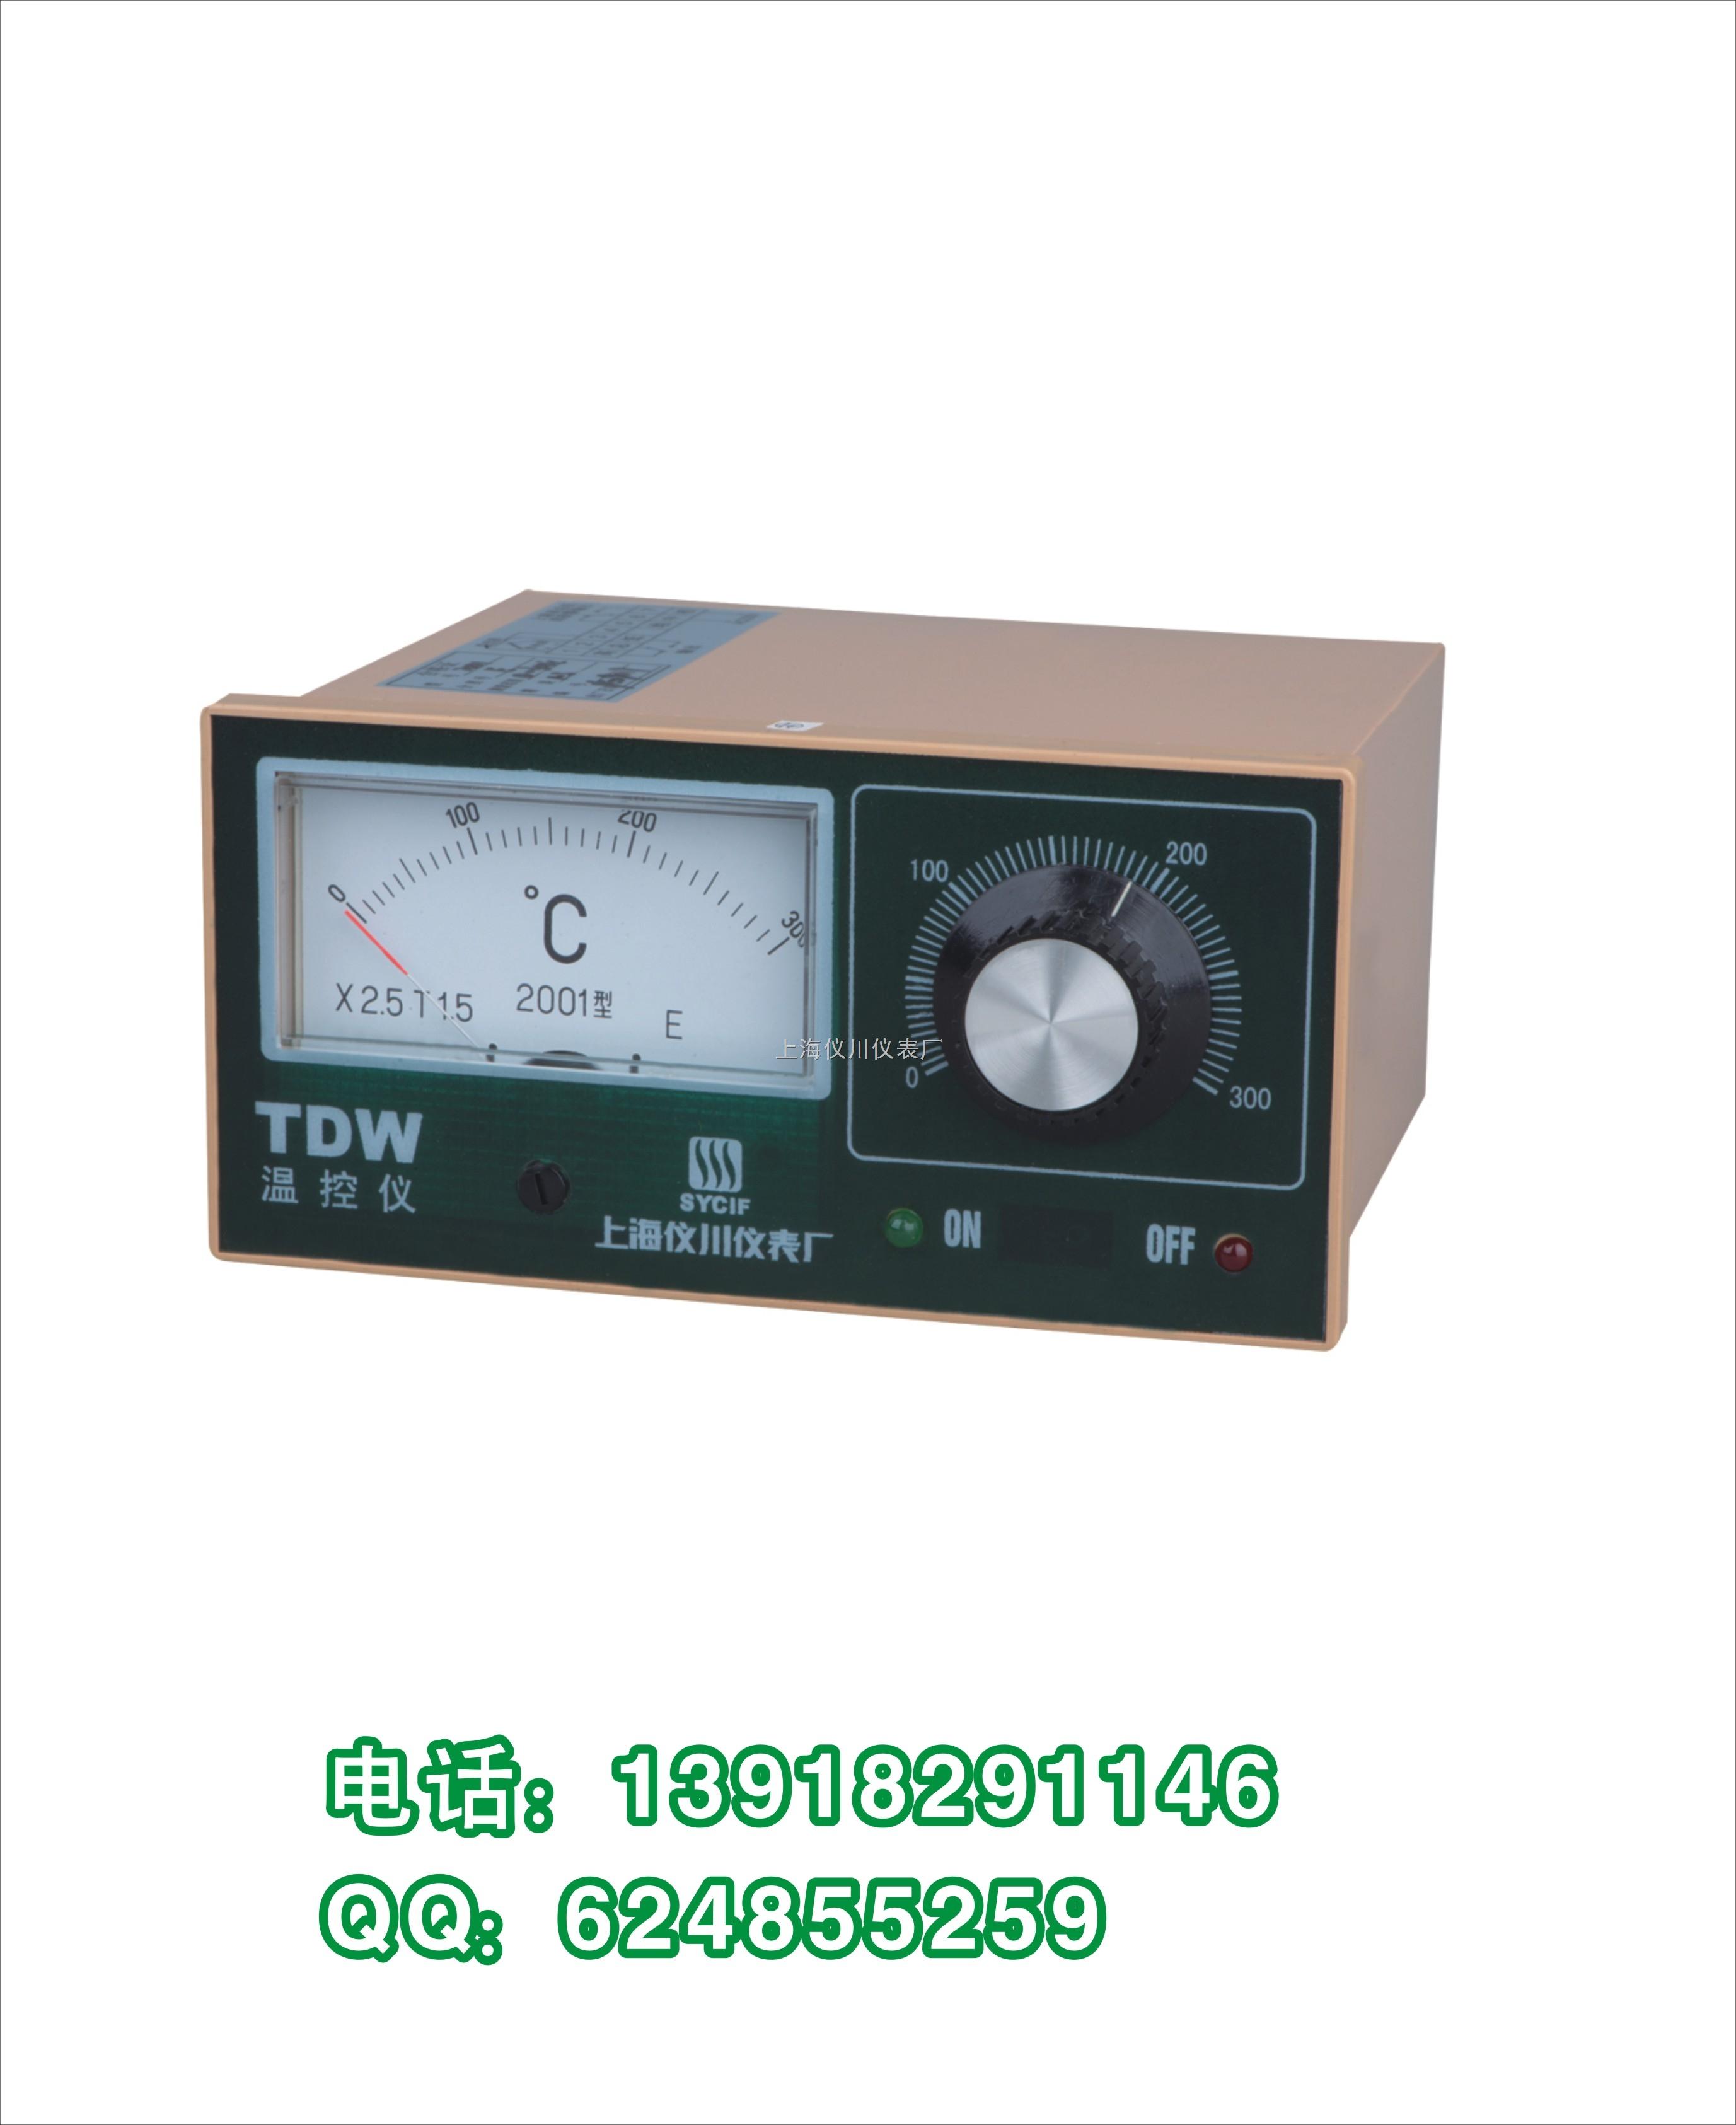 tdw-2702-温度控制仪-上海仪川仪表厂